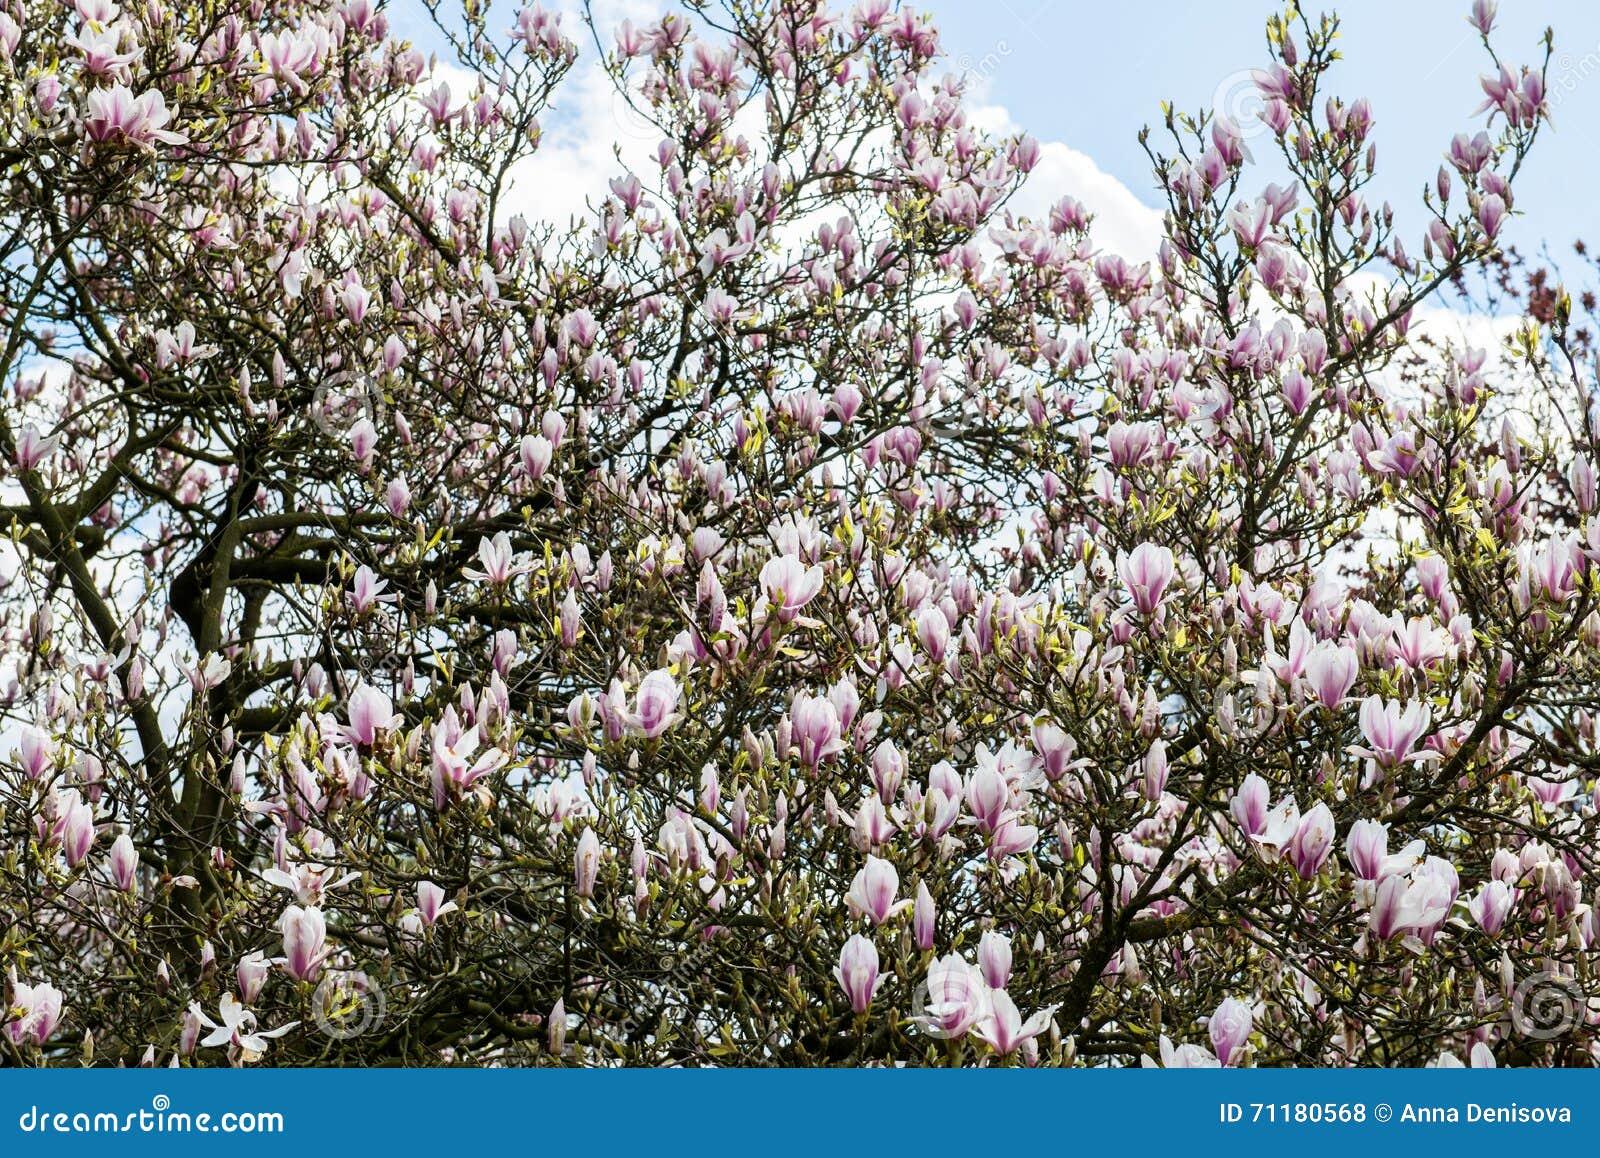 Light Pink Magnolia Tree Stock Photo Image Of Pleasure 71180568